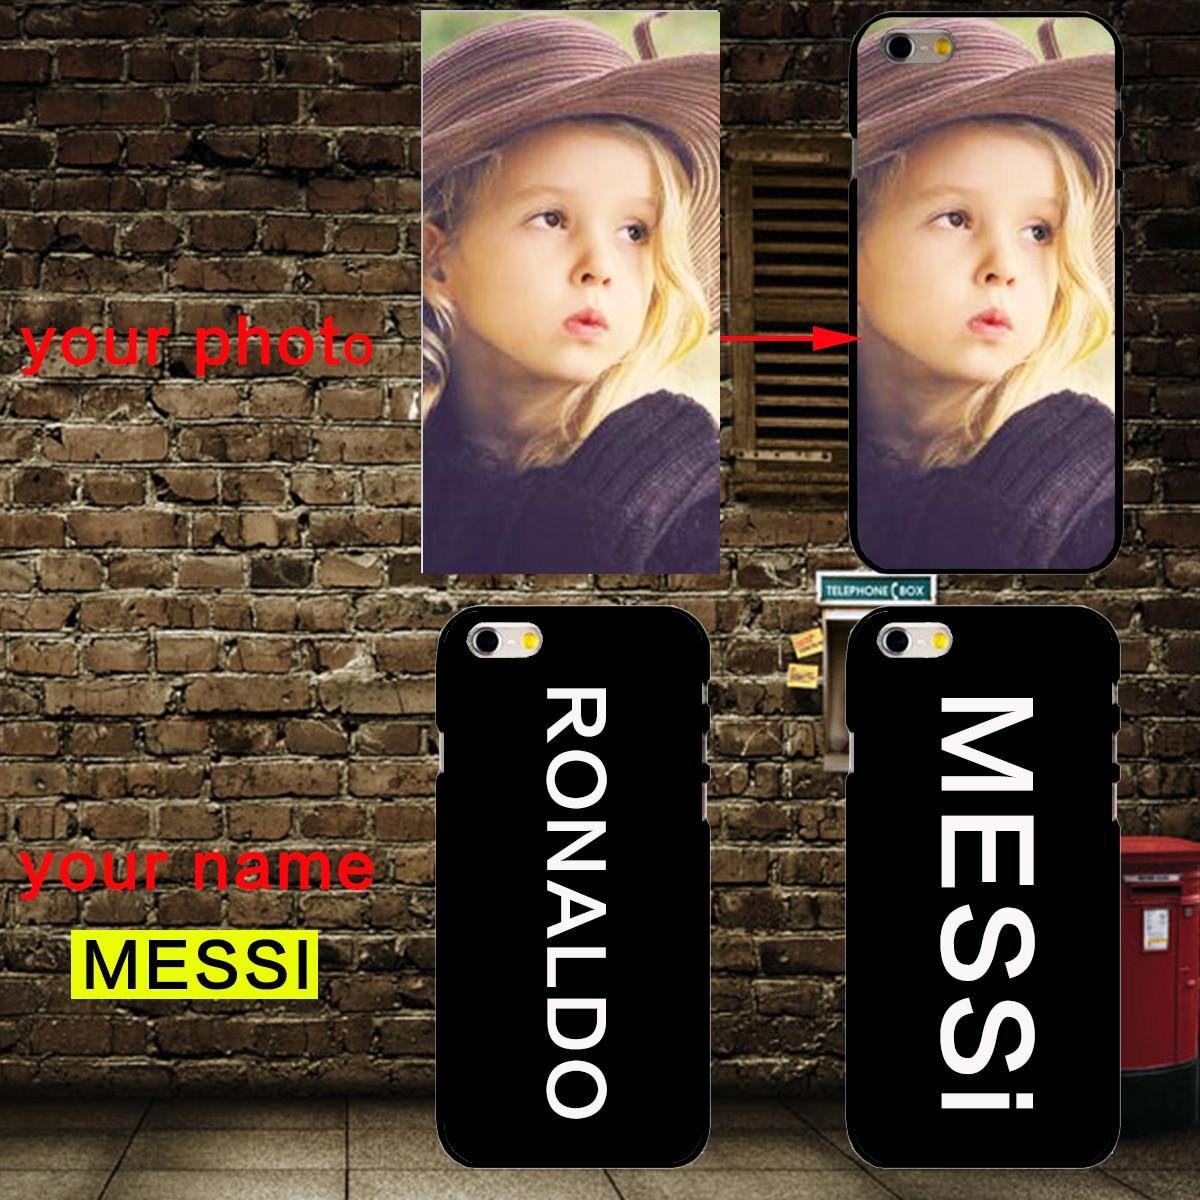 Haoweiming Кармело Энтони силикона силиконовый чехол для samsung Galaxy J2 J3 J4 J5 J6 J7 Prime 2016 2017 h512